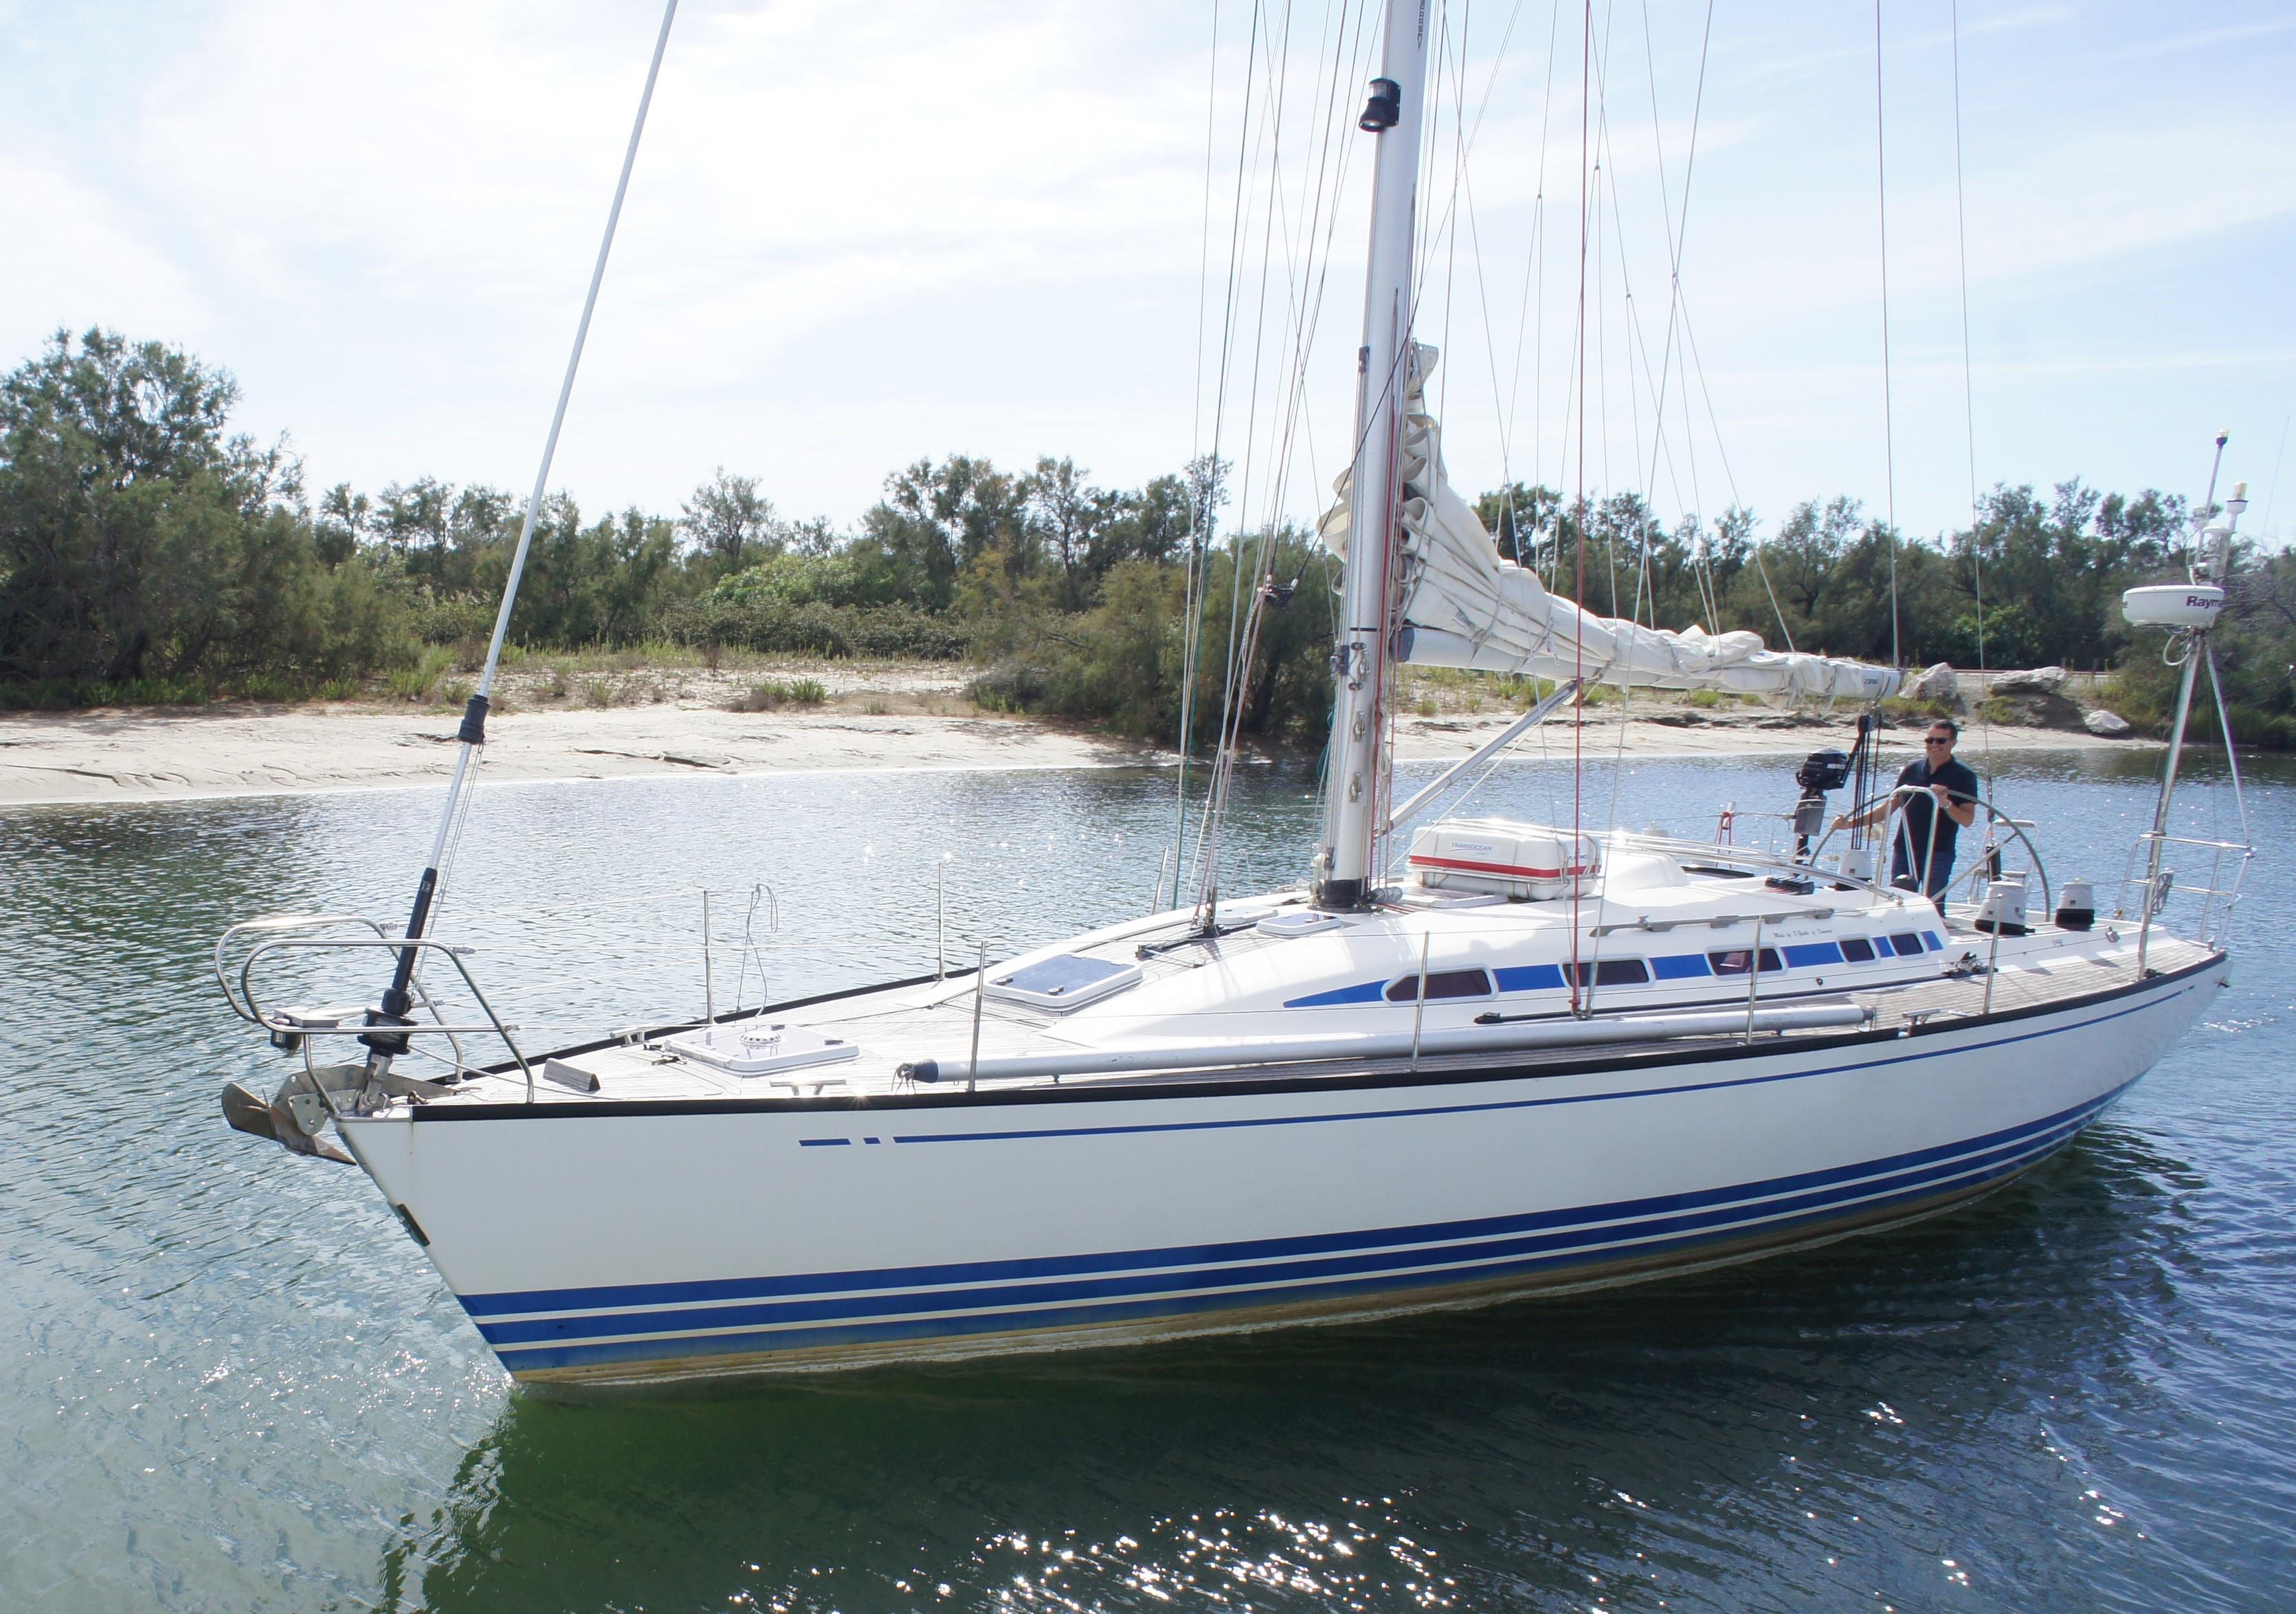 X-Yachts X-442 X-yachts 442